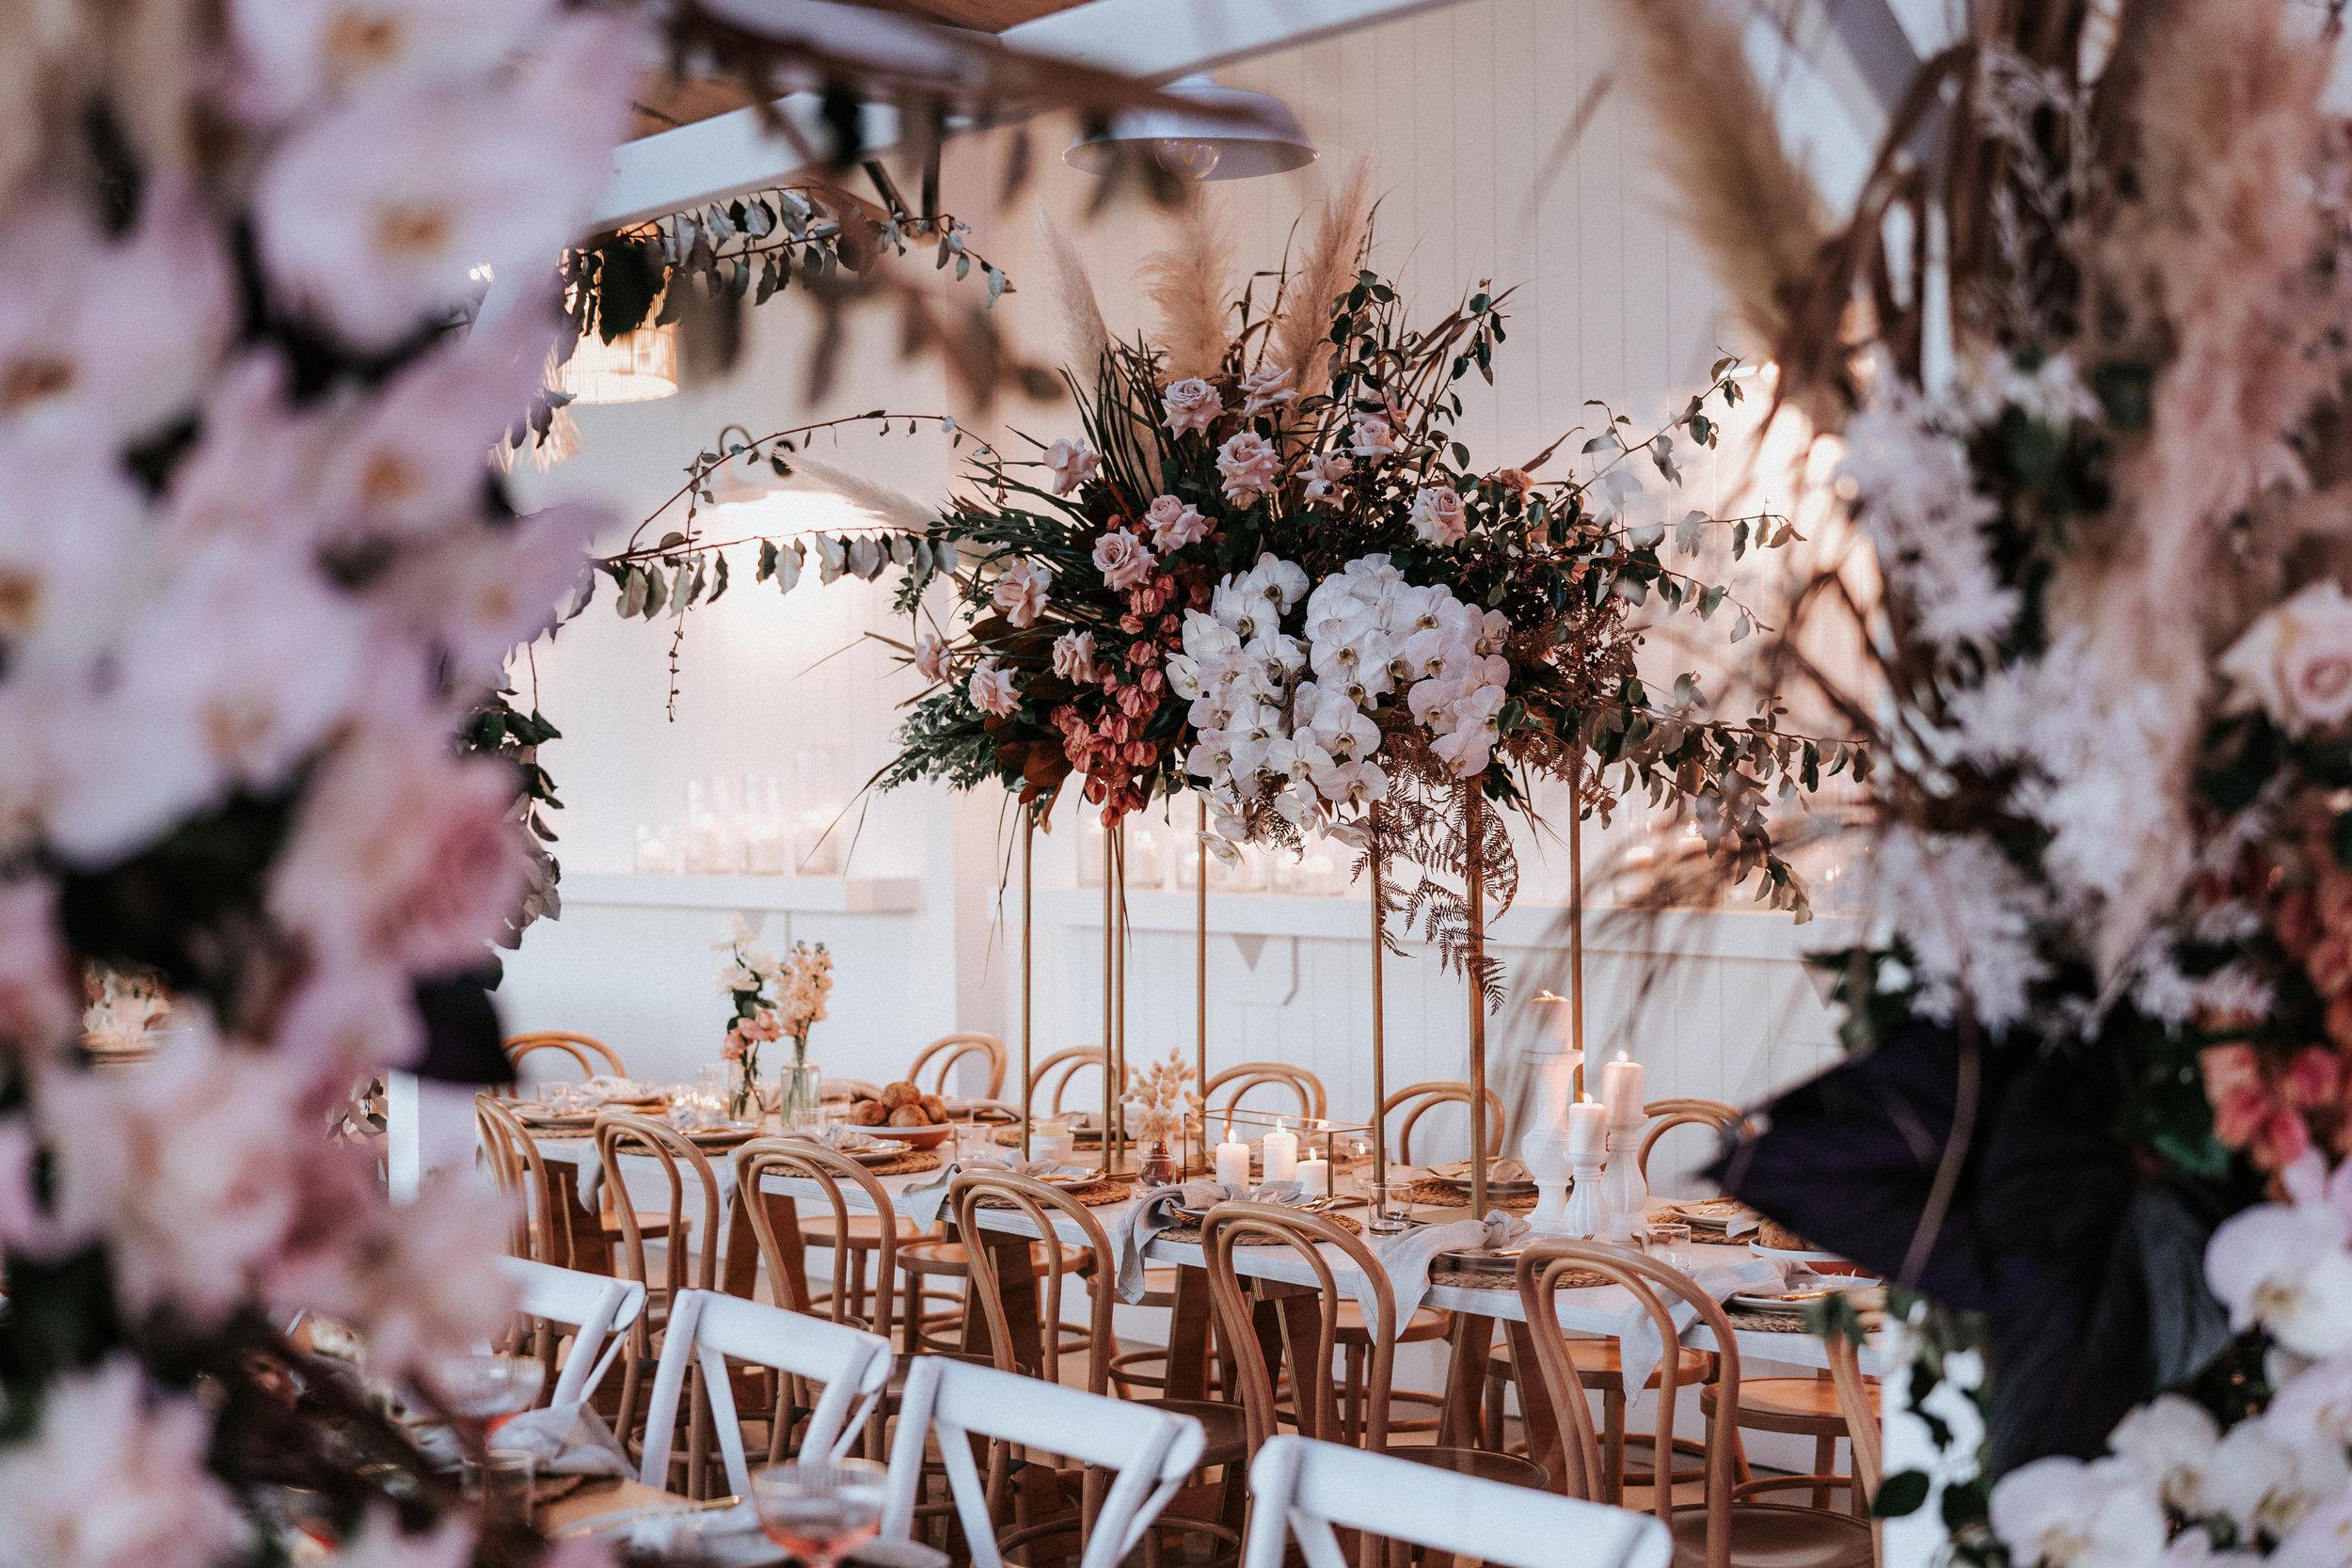 gemaya-tim-bilmon-wedding-790.jpg